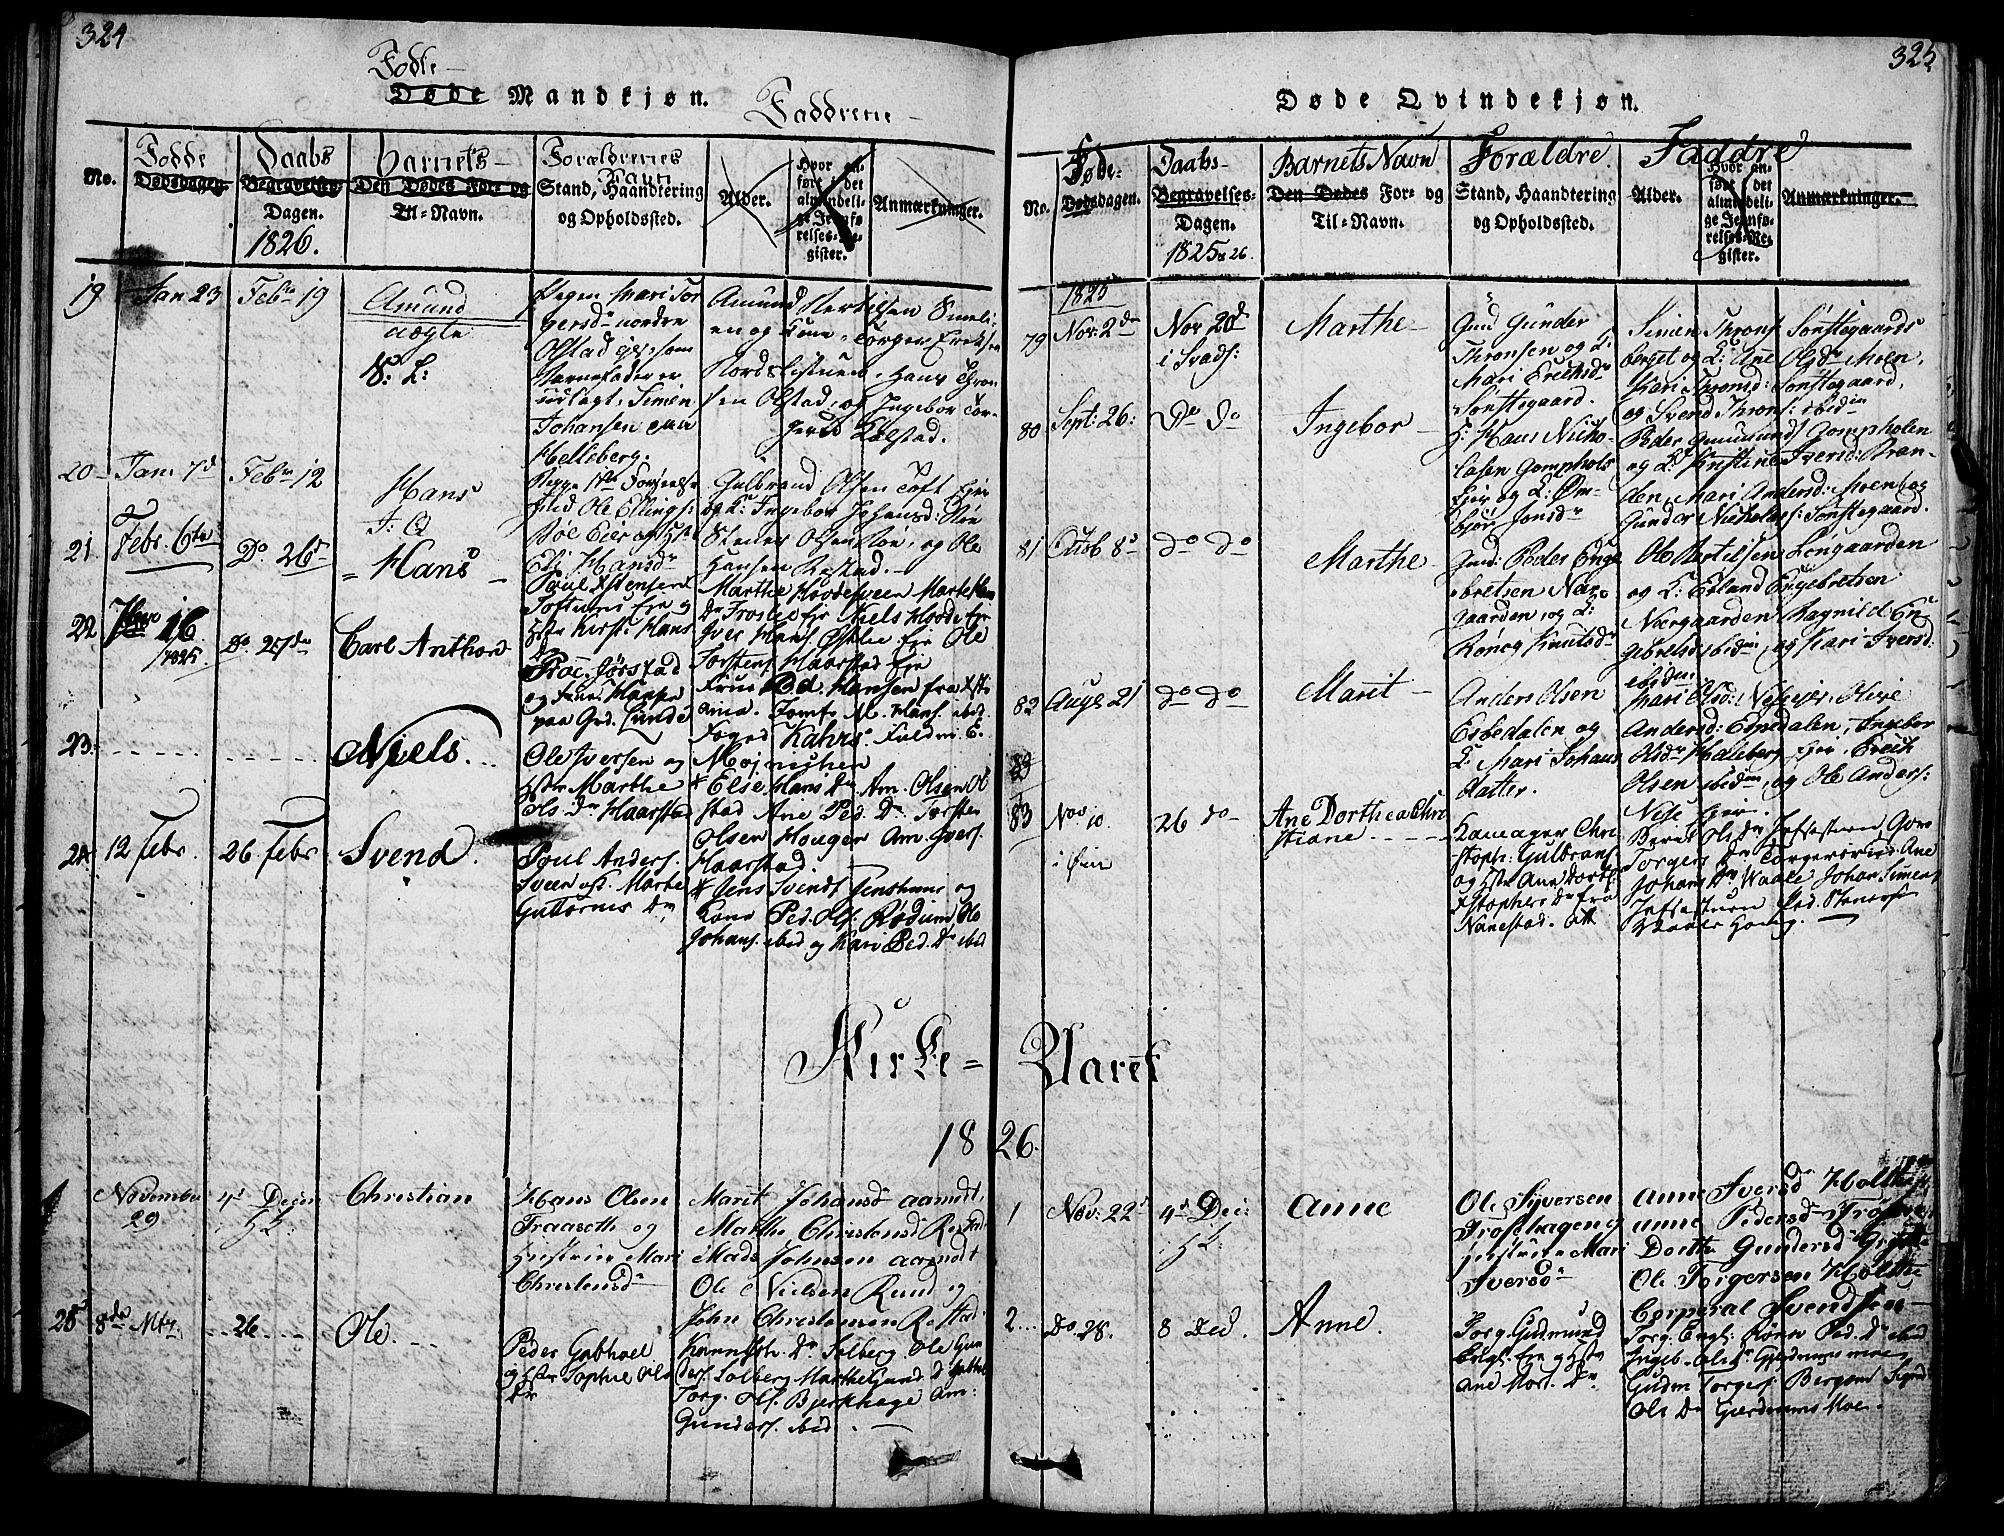 SAH, Gausdal prestekontor, Ministerialbok nr. 5, 1817-1829, s. 324-325